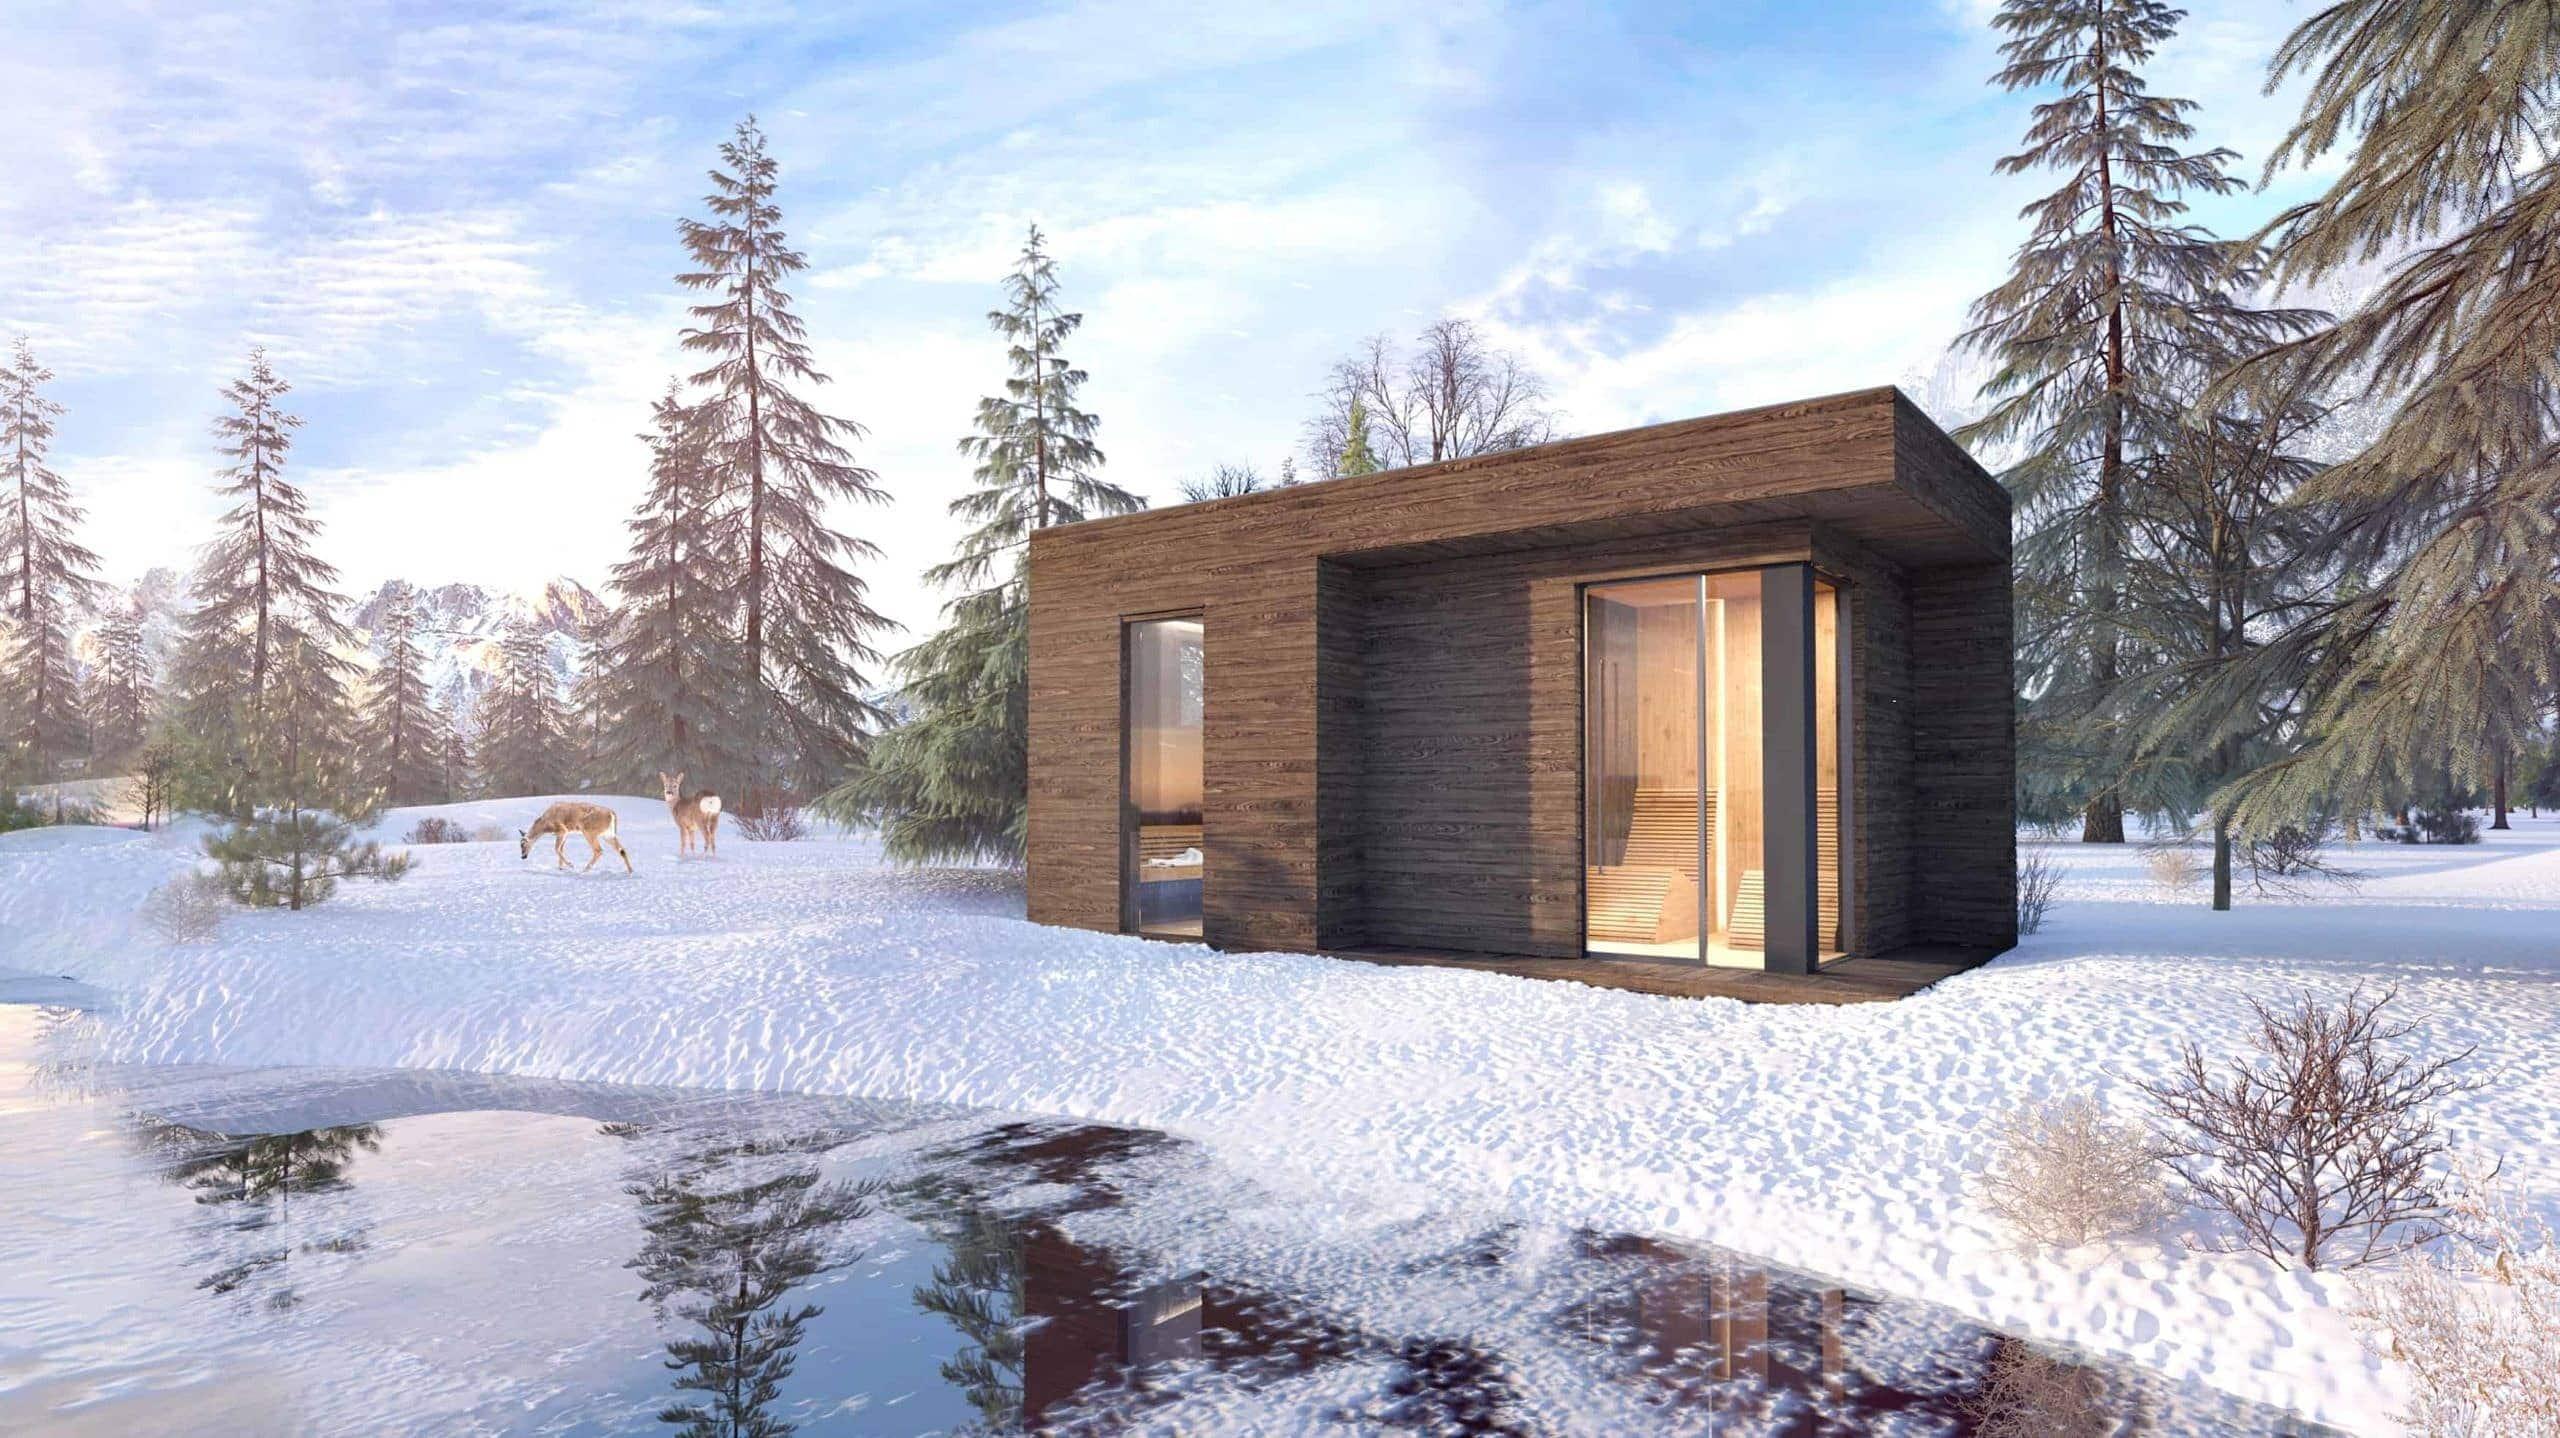 Nowoczesna sauna ogrodowa SCANDIT - produkt klasy premium